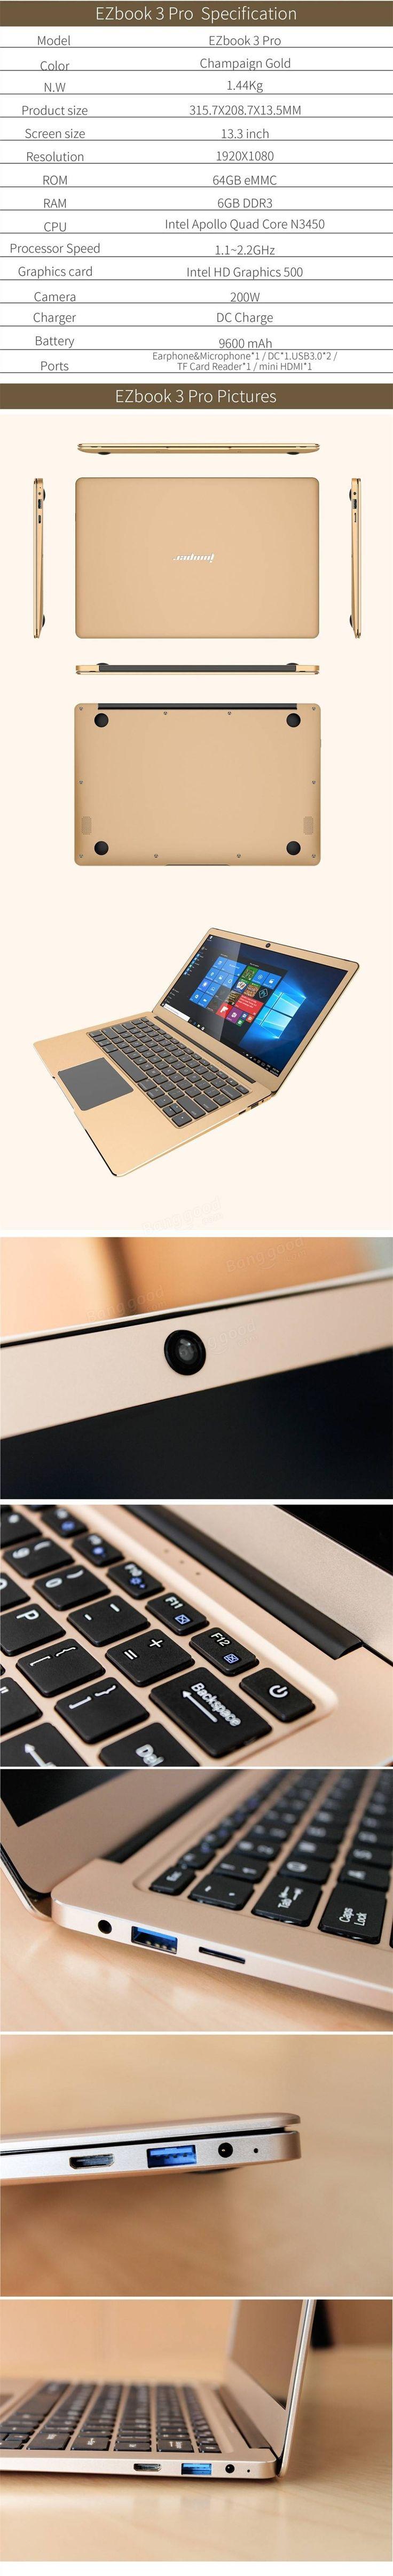 JumperEZBOOK3PRONotebook13,3 Zoll 6G / 64G Windows10 Intel Apollo See N3450 Laptop